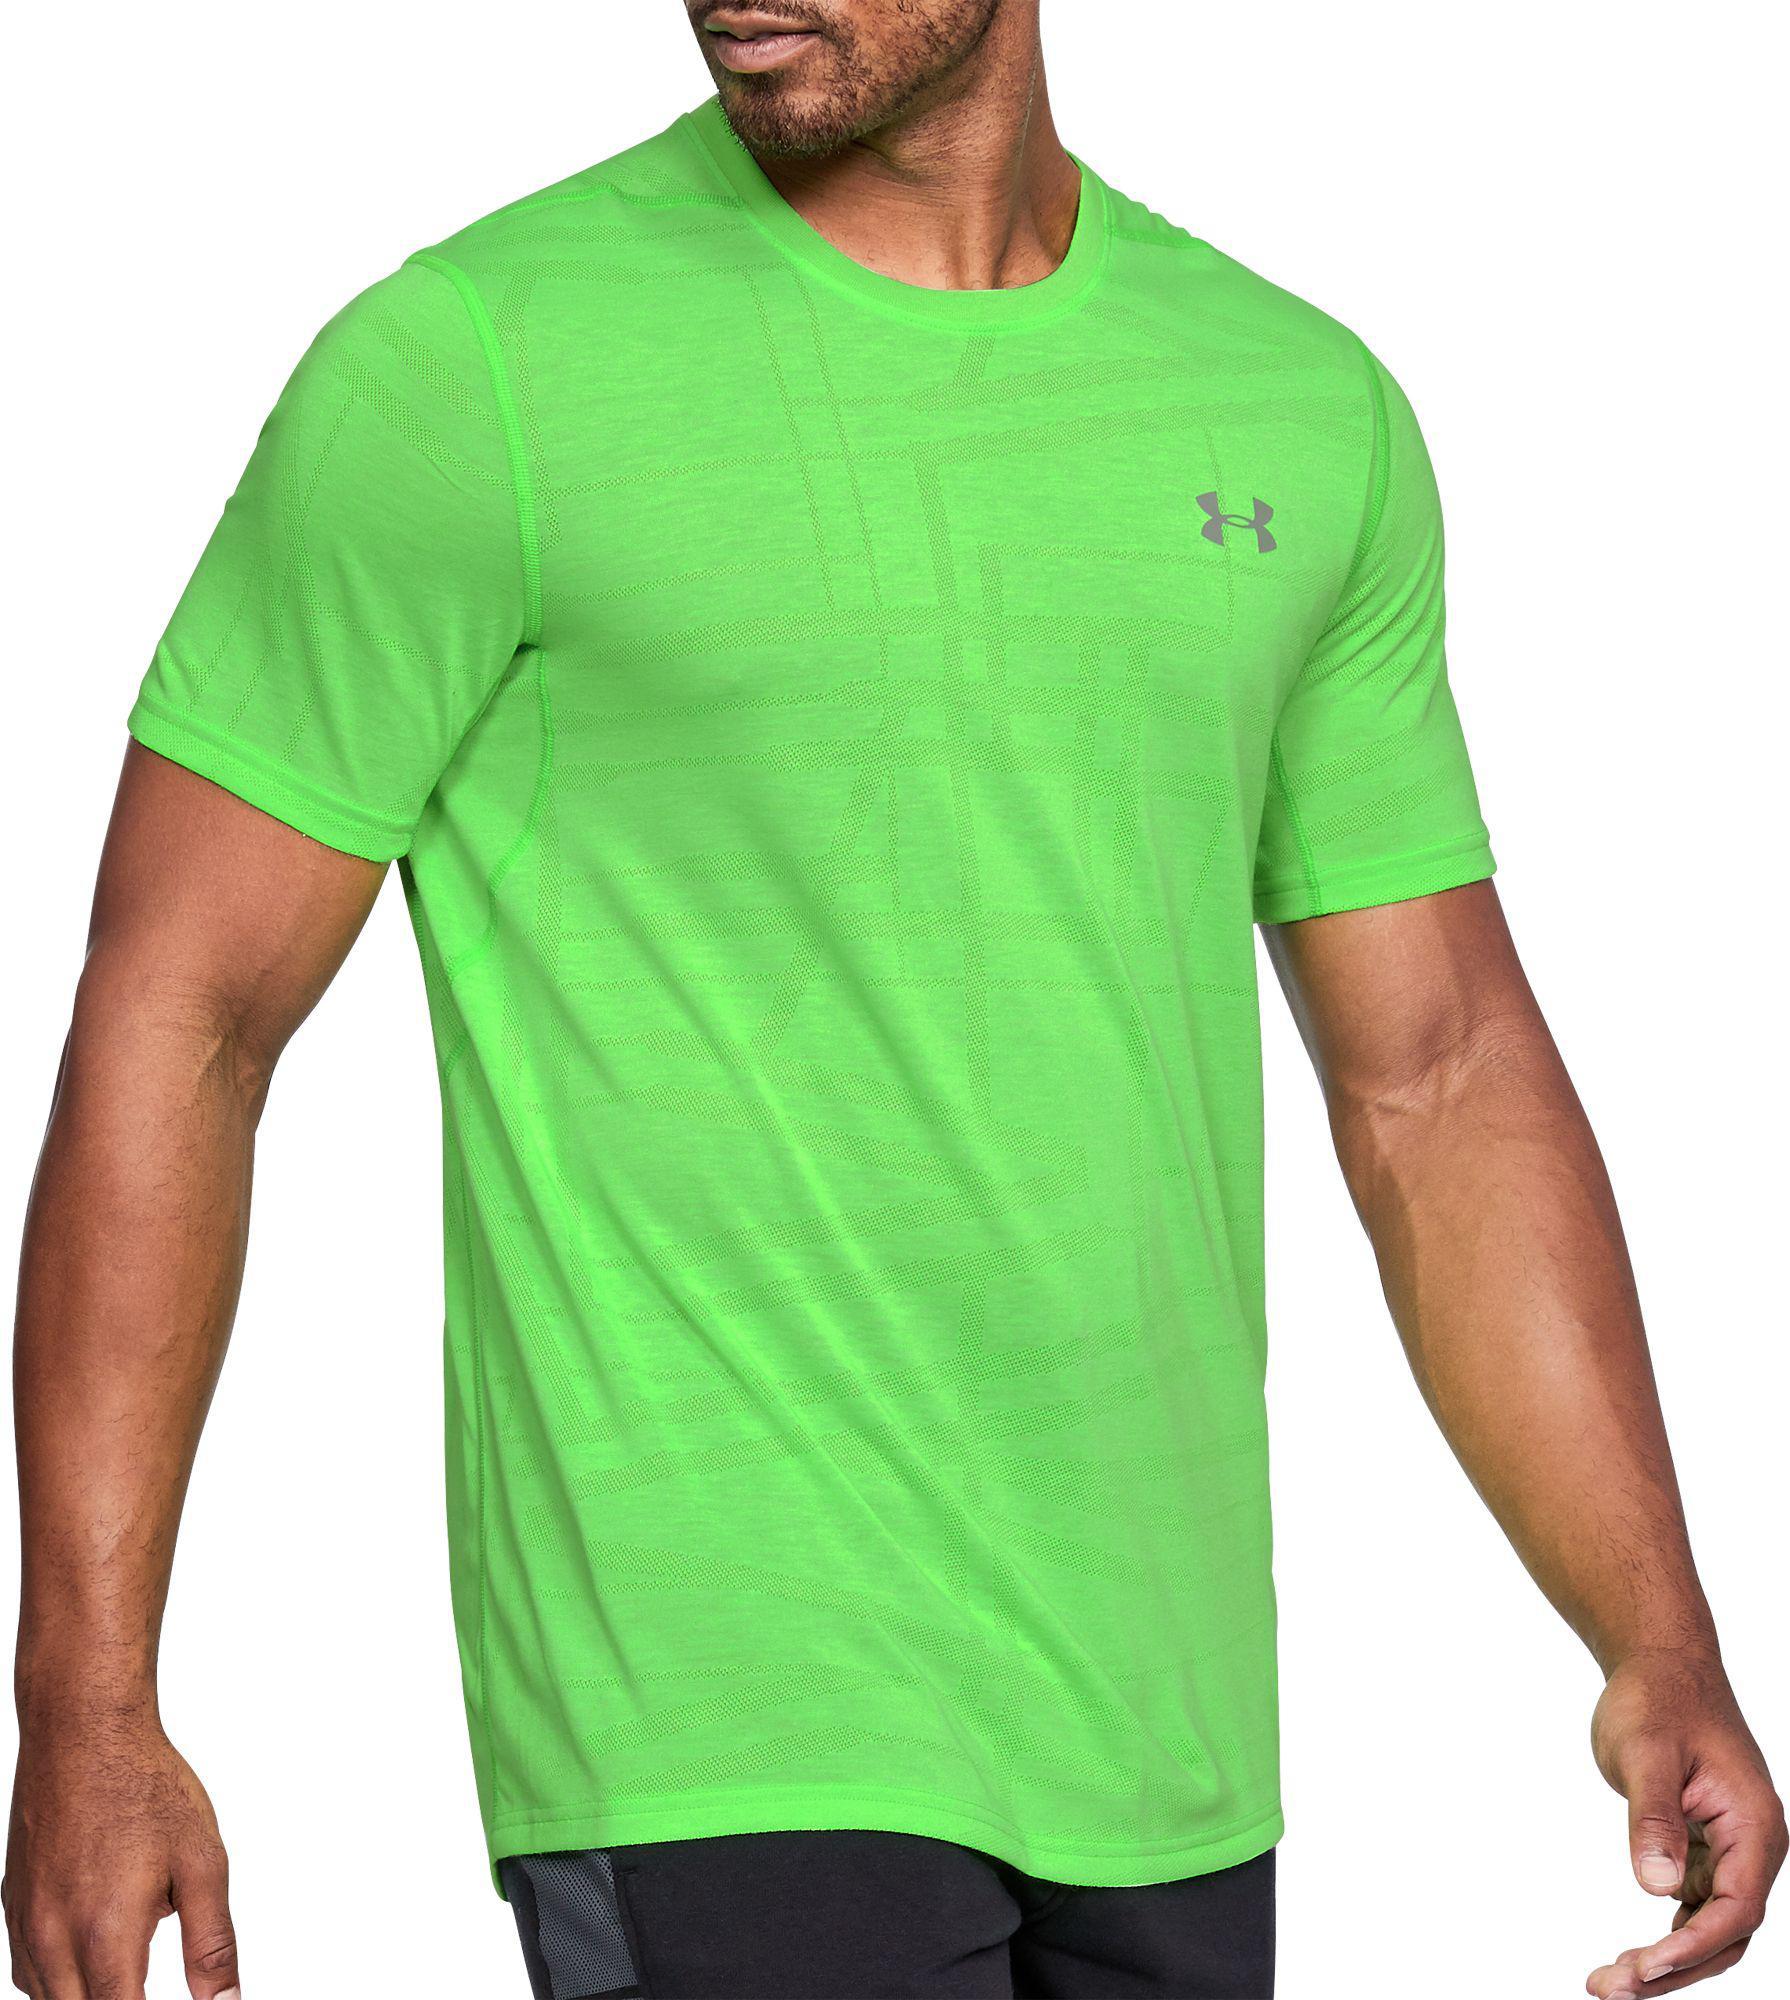 a280184f Under Armour Threadborne Siro Elite T-shirt in Green for Men - Lyst